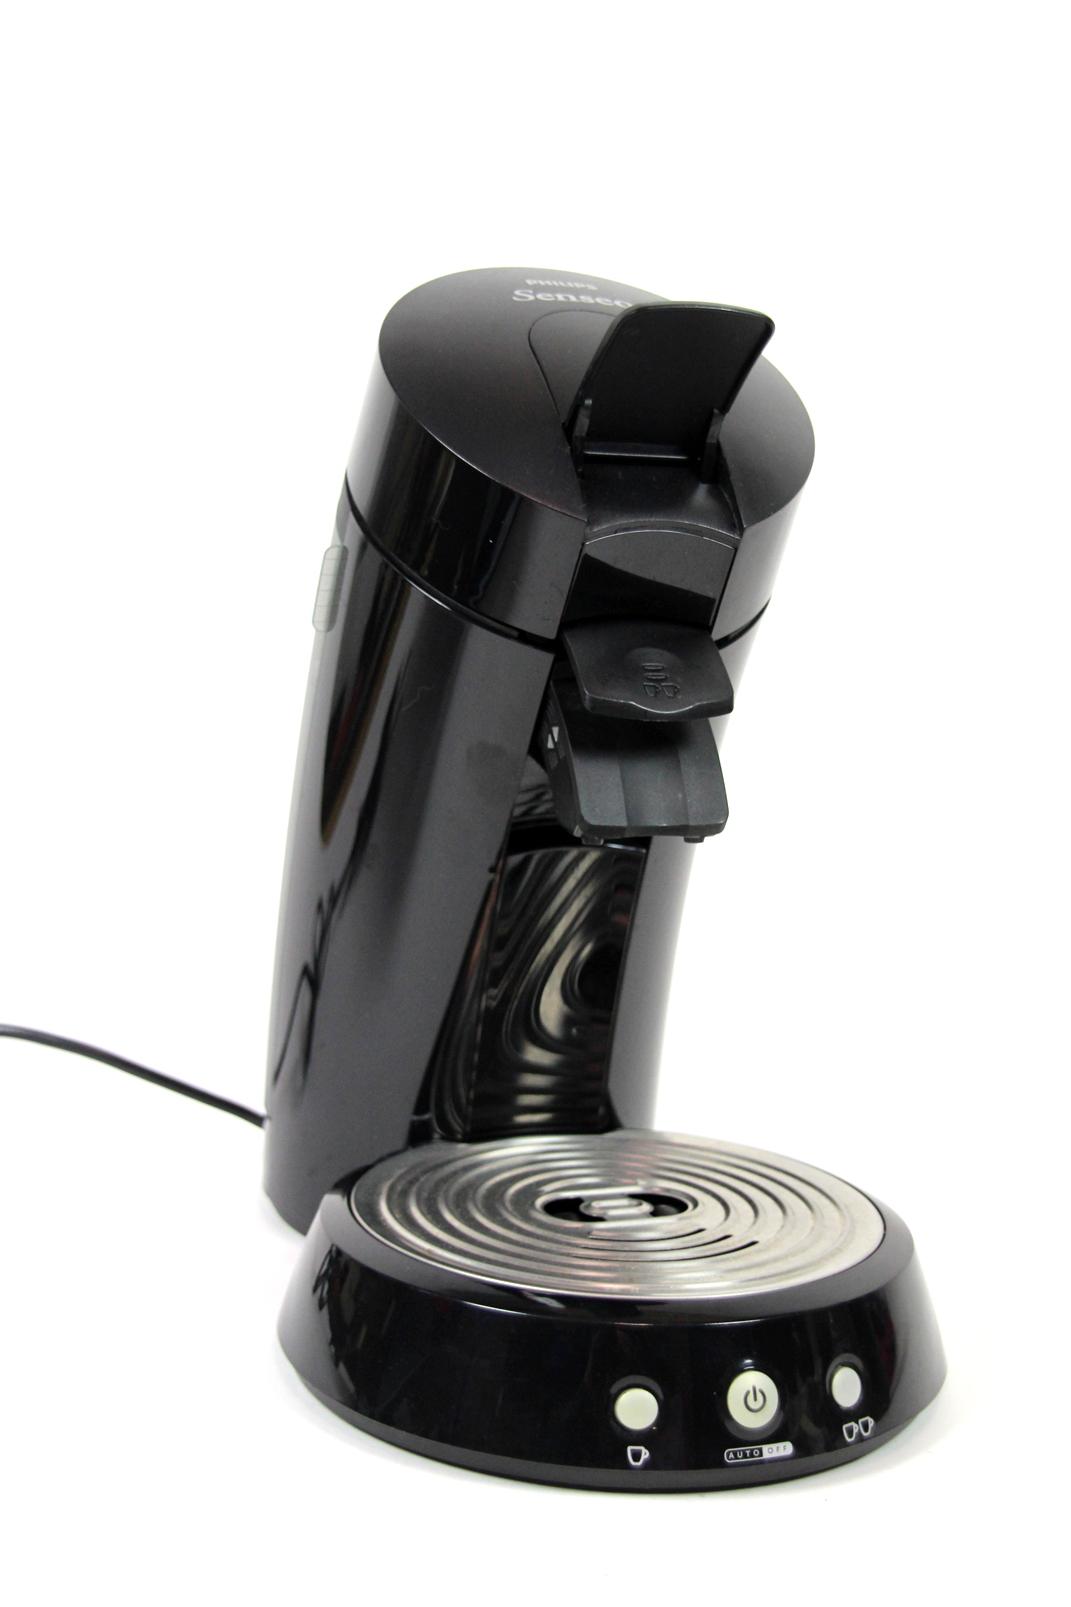 philips senseo hd 7820 69 kaffeepadmaschine kaffeemaschine 1450 w mit padhalter ebay. Black Bedroom Furniture Sets. Home Design Ideas